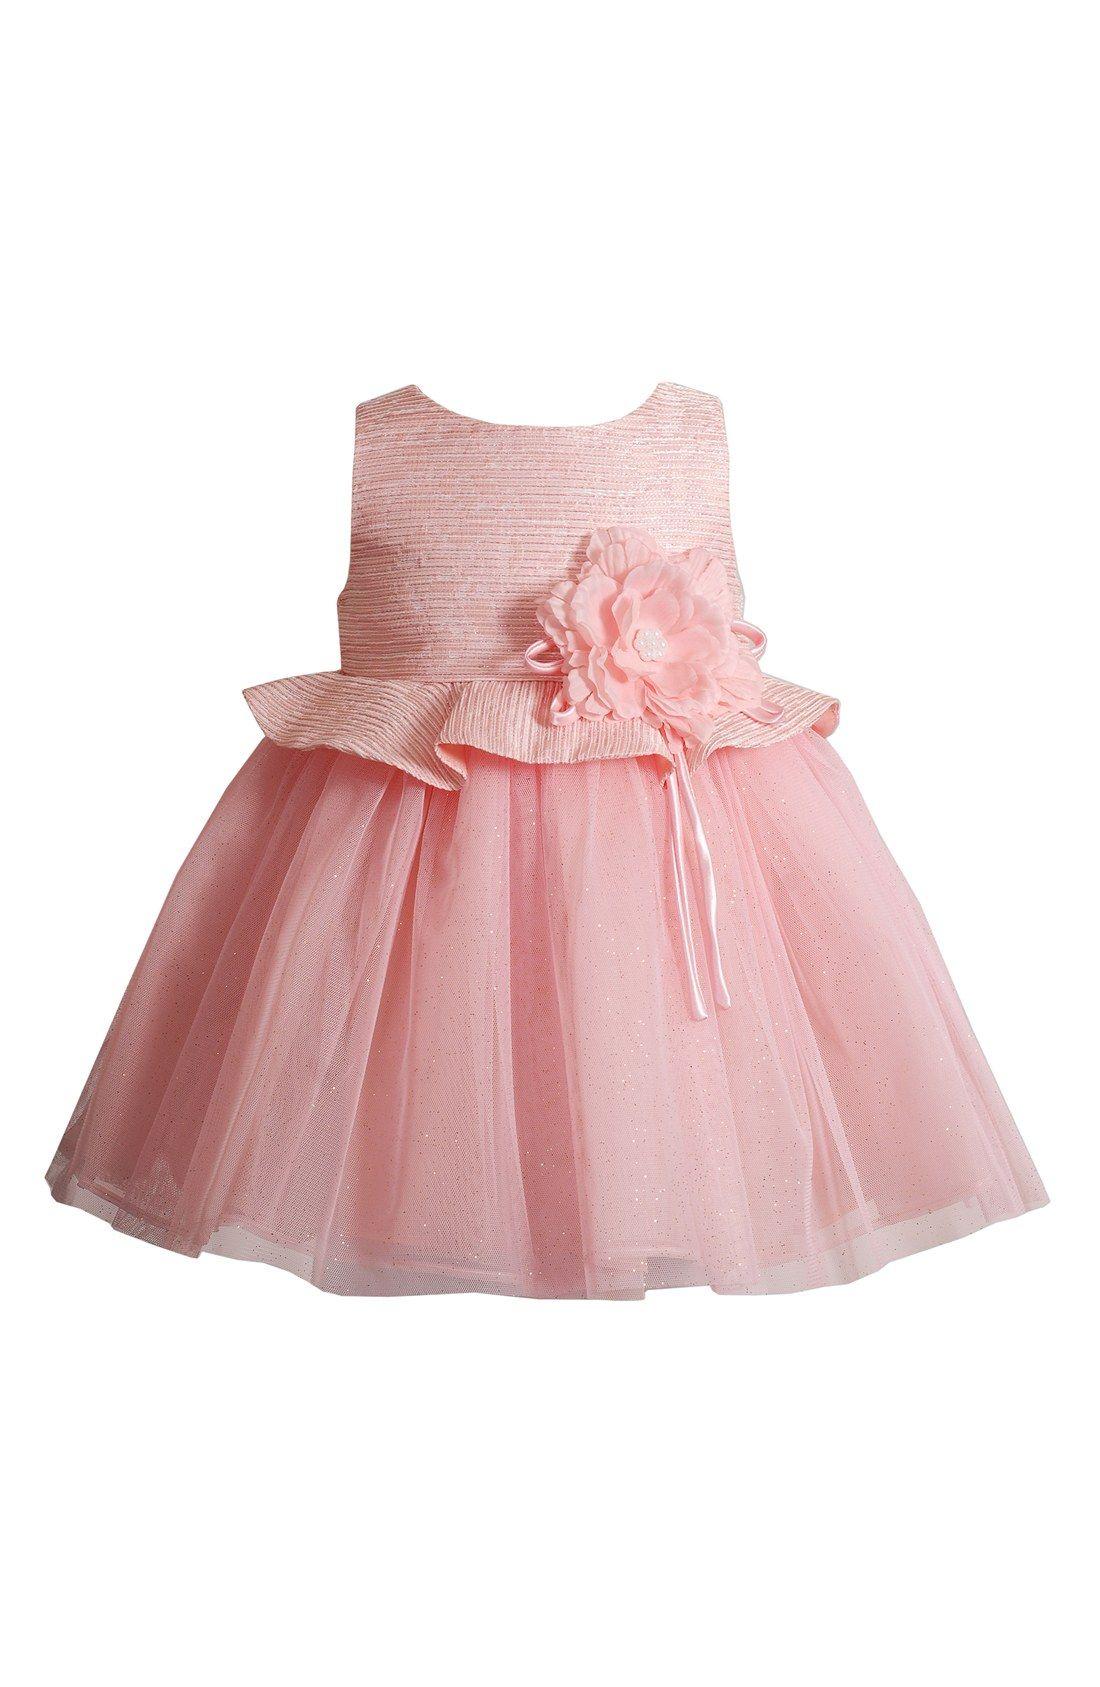 Kleinfeld Pink \'Julianna\' Sleeveless Dress (Baby Girls) | Clementine ...